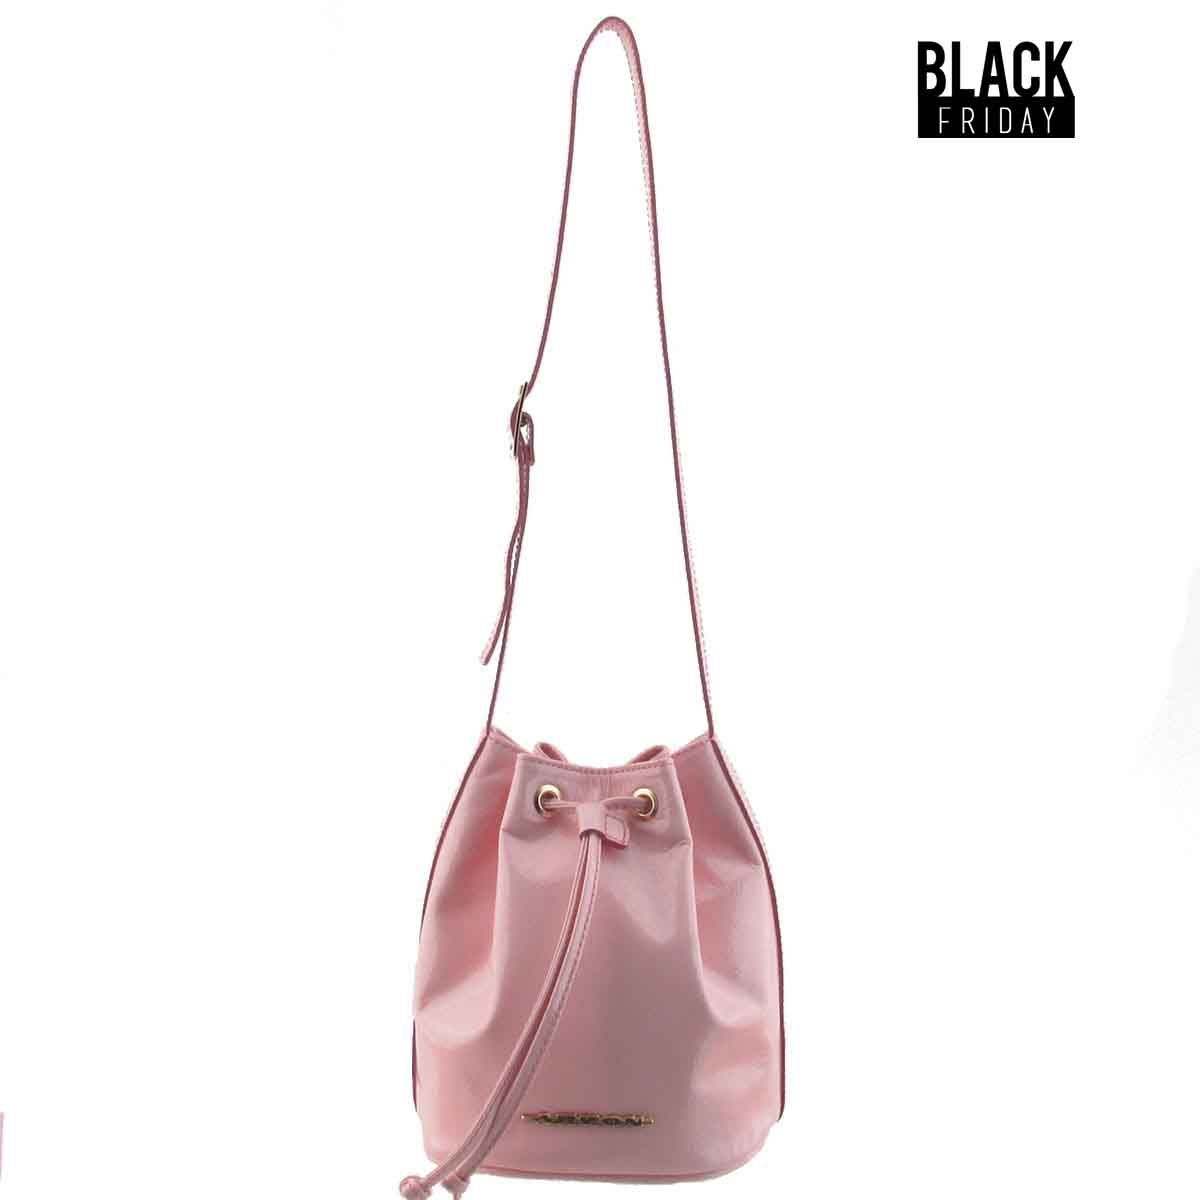 Bolsa saco pequena rosa - Black friday porta di roma ...